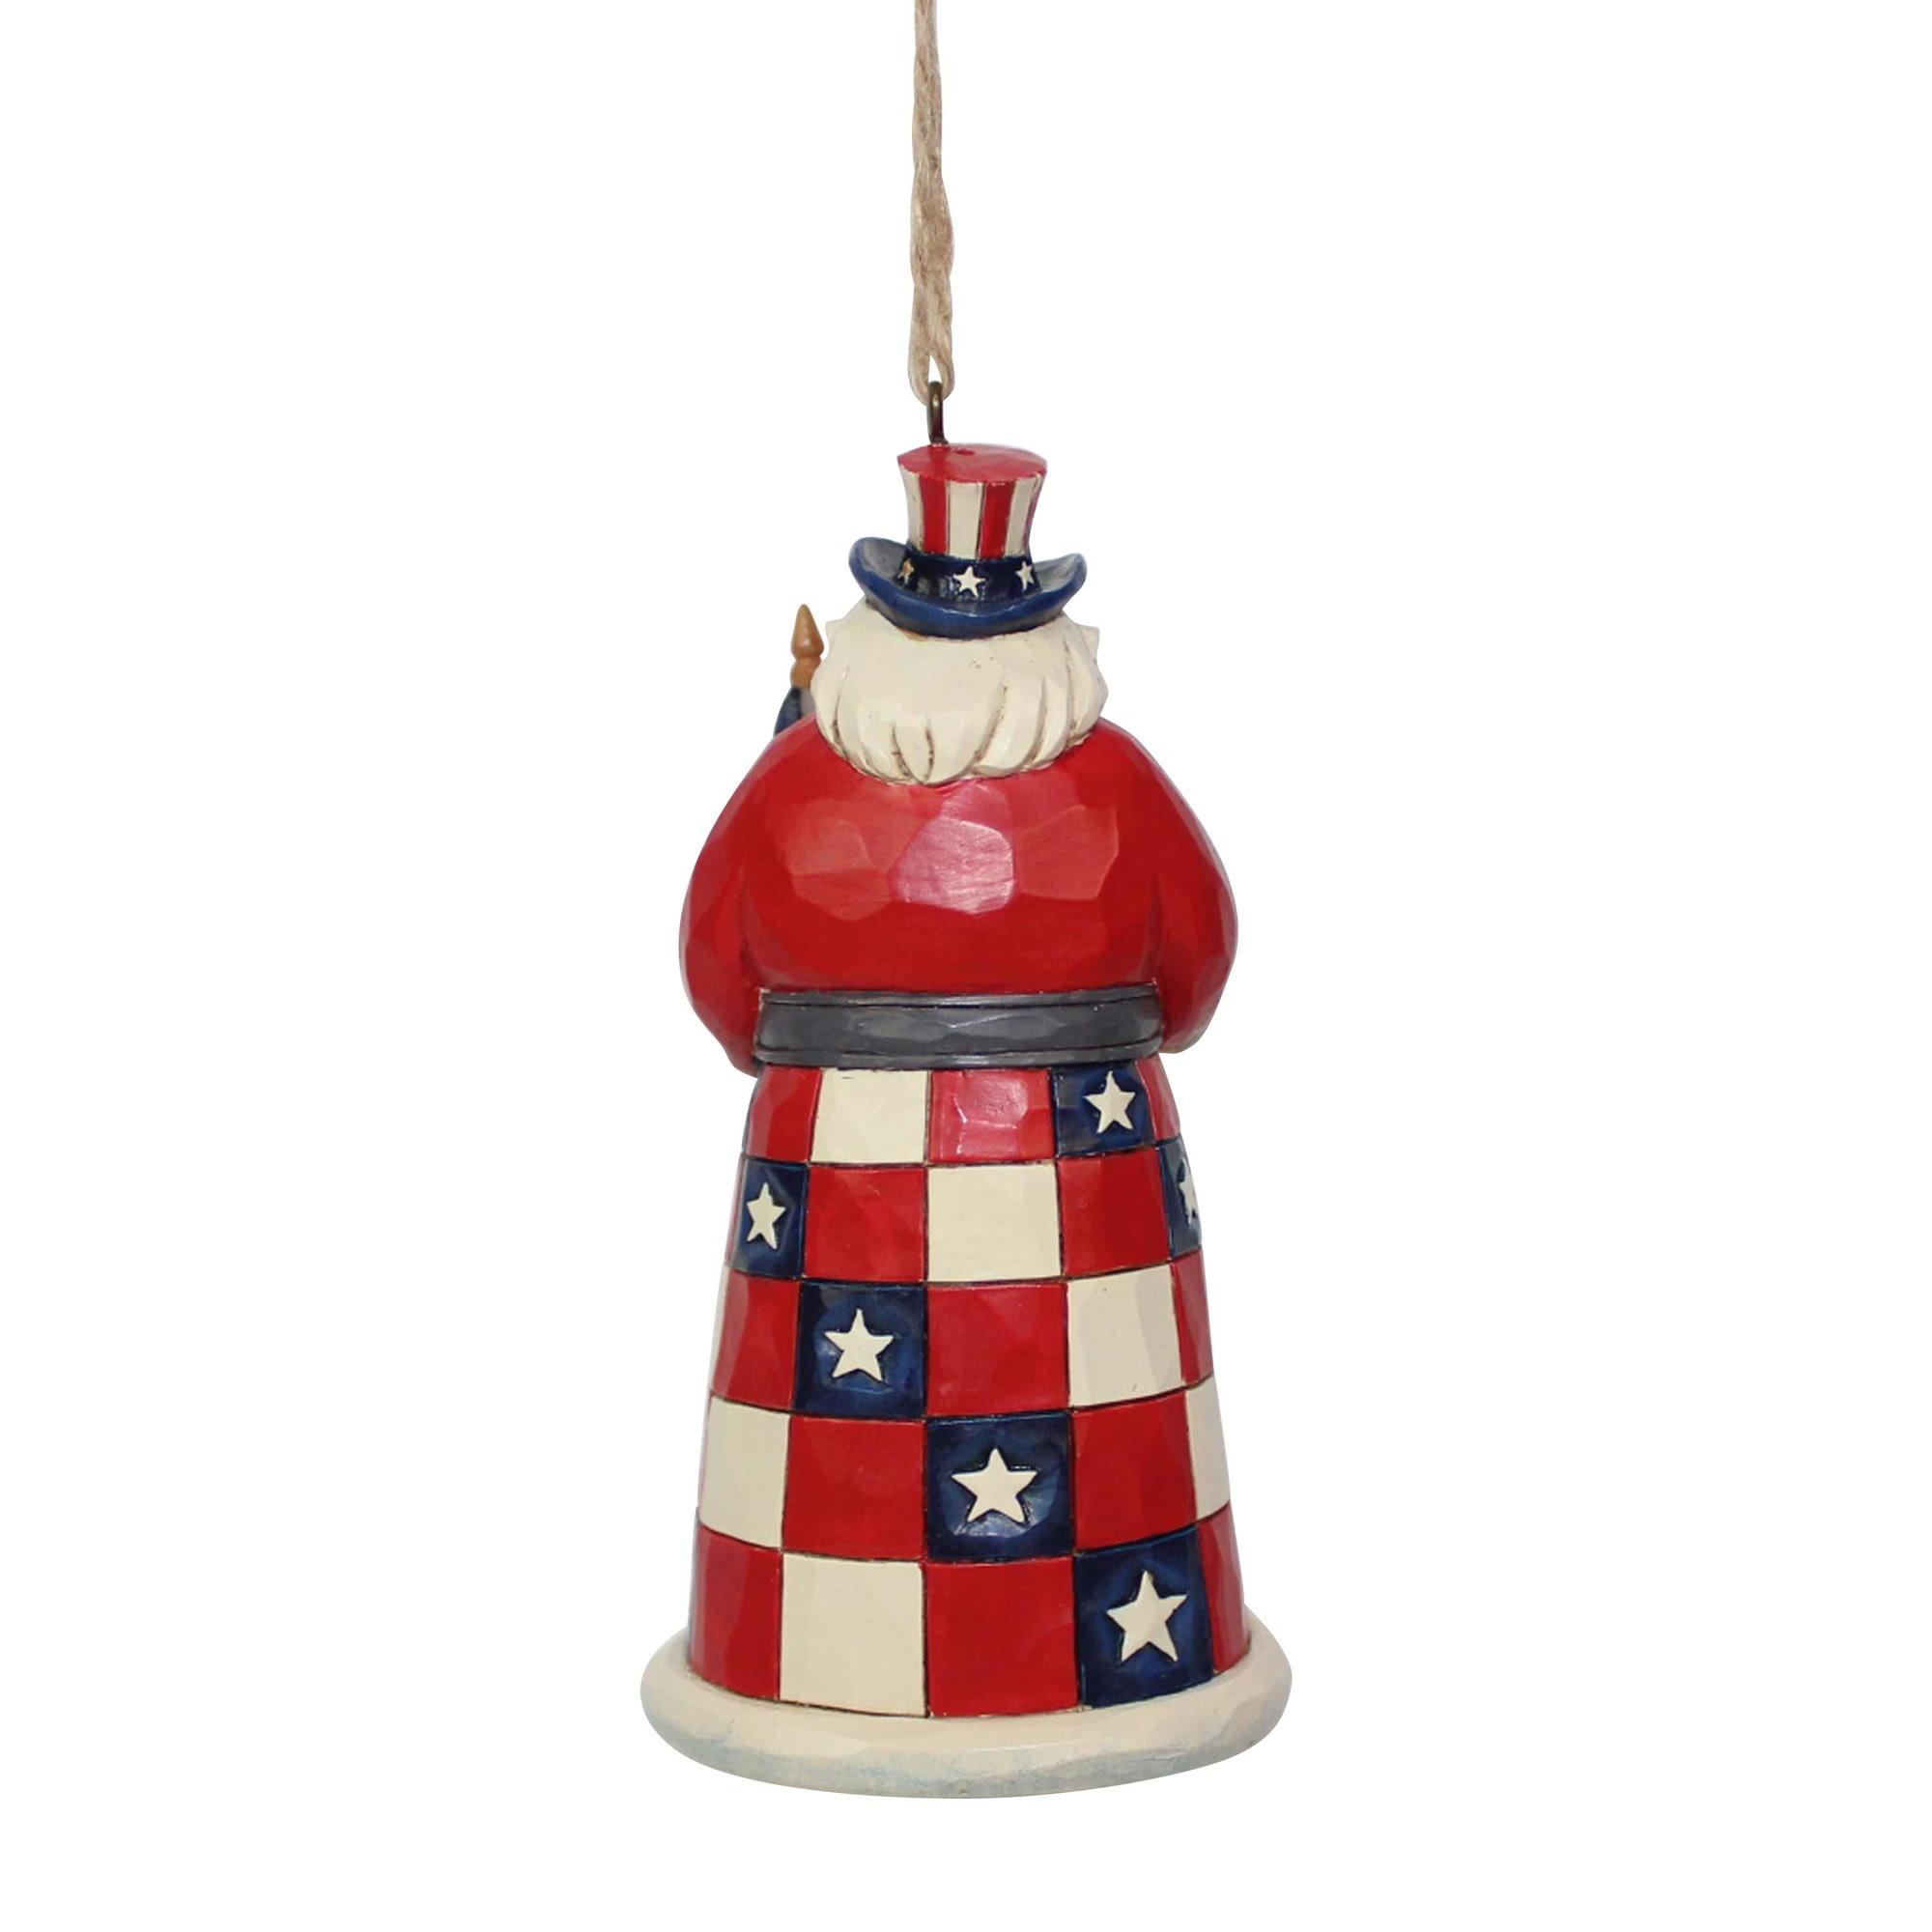 Jim Shore American Santa Ornament